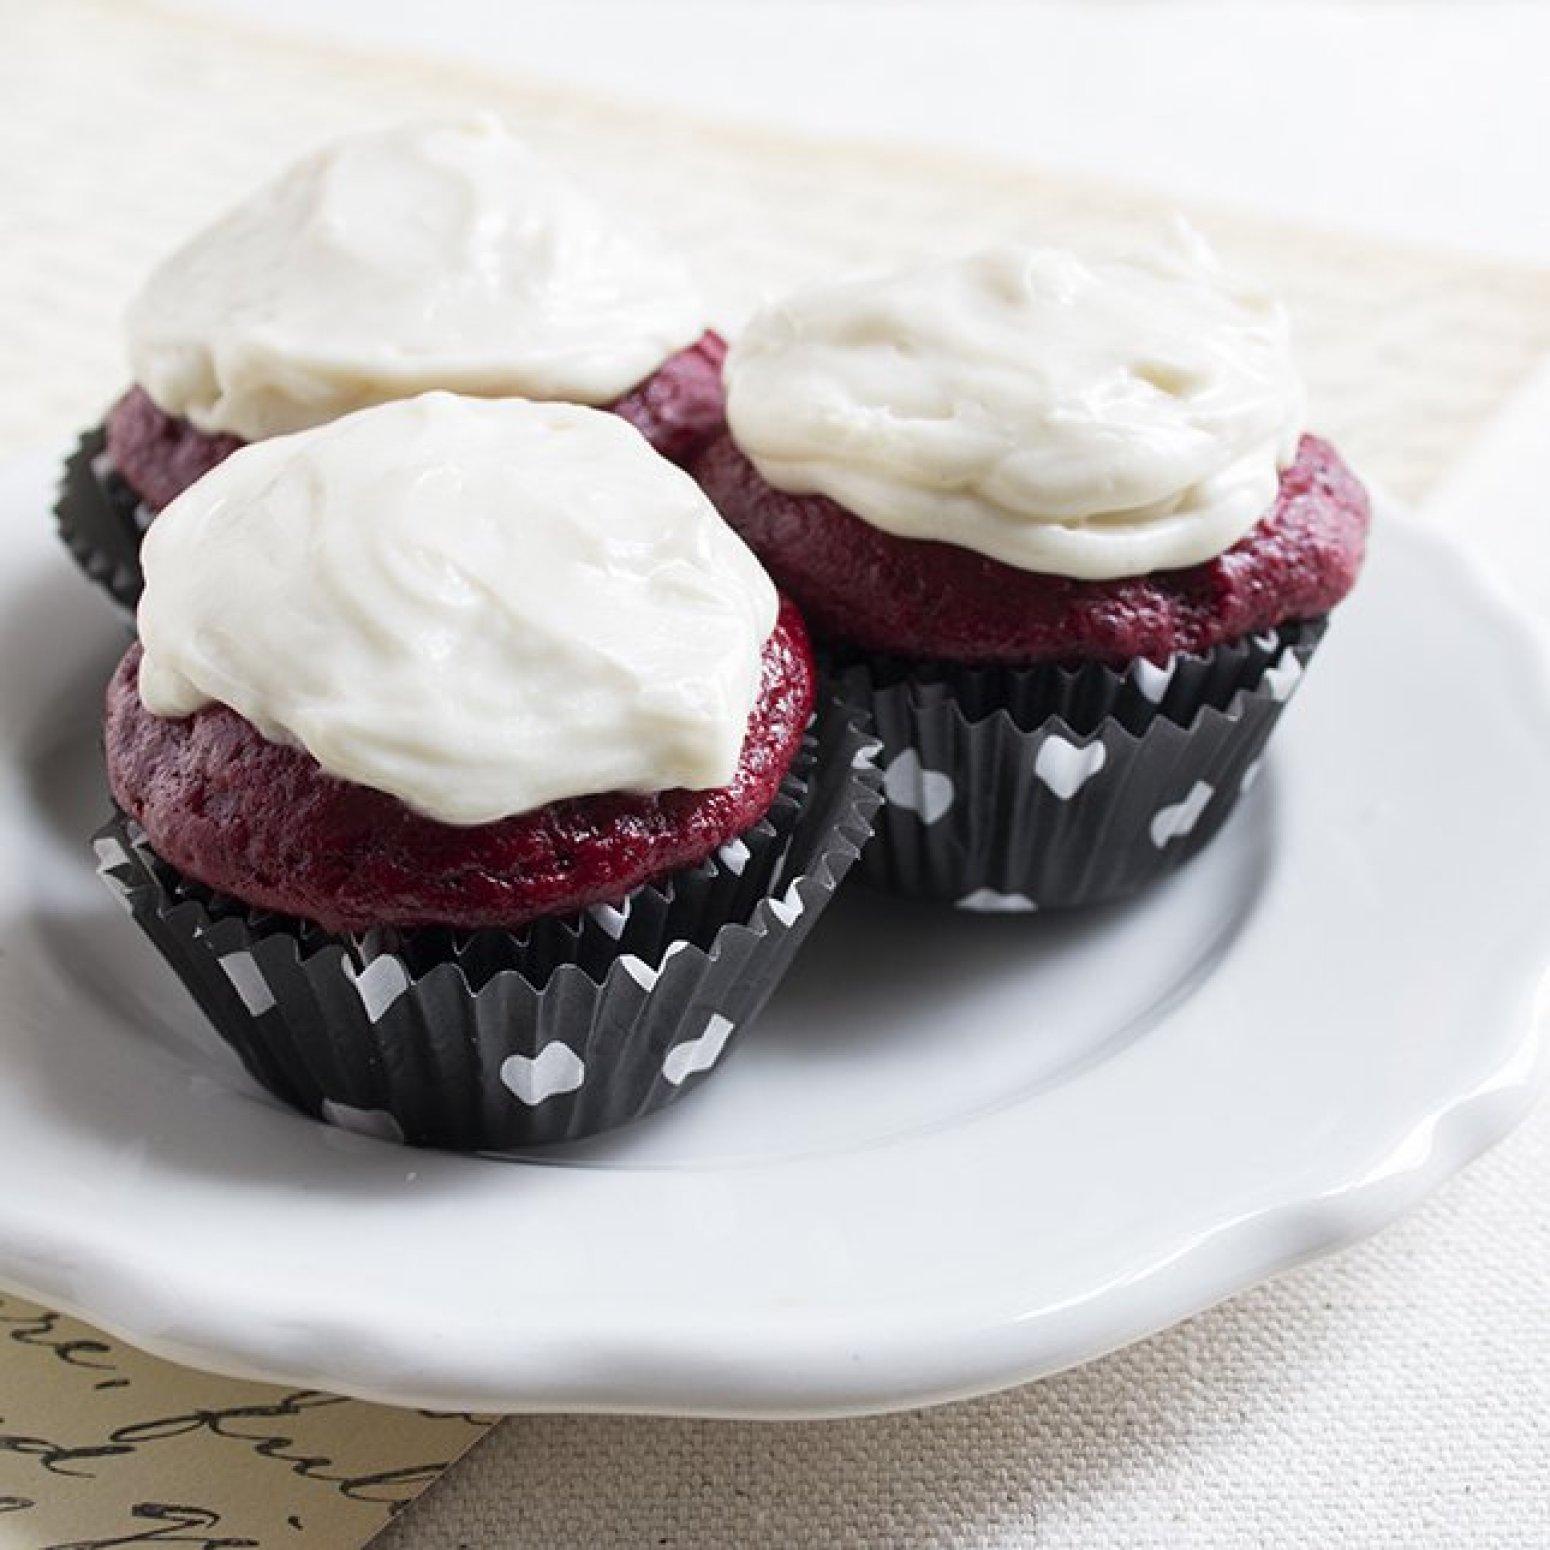 Skinny Mini Red Velvet Cupcakes Recipe | Just A Pinch Recipes